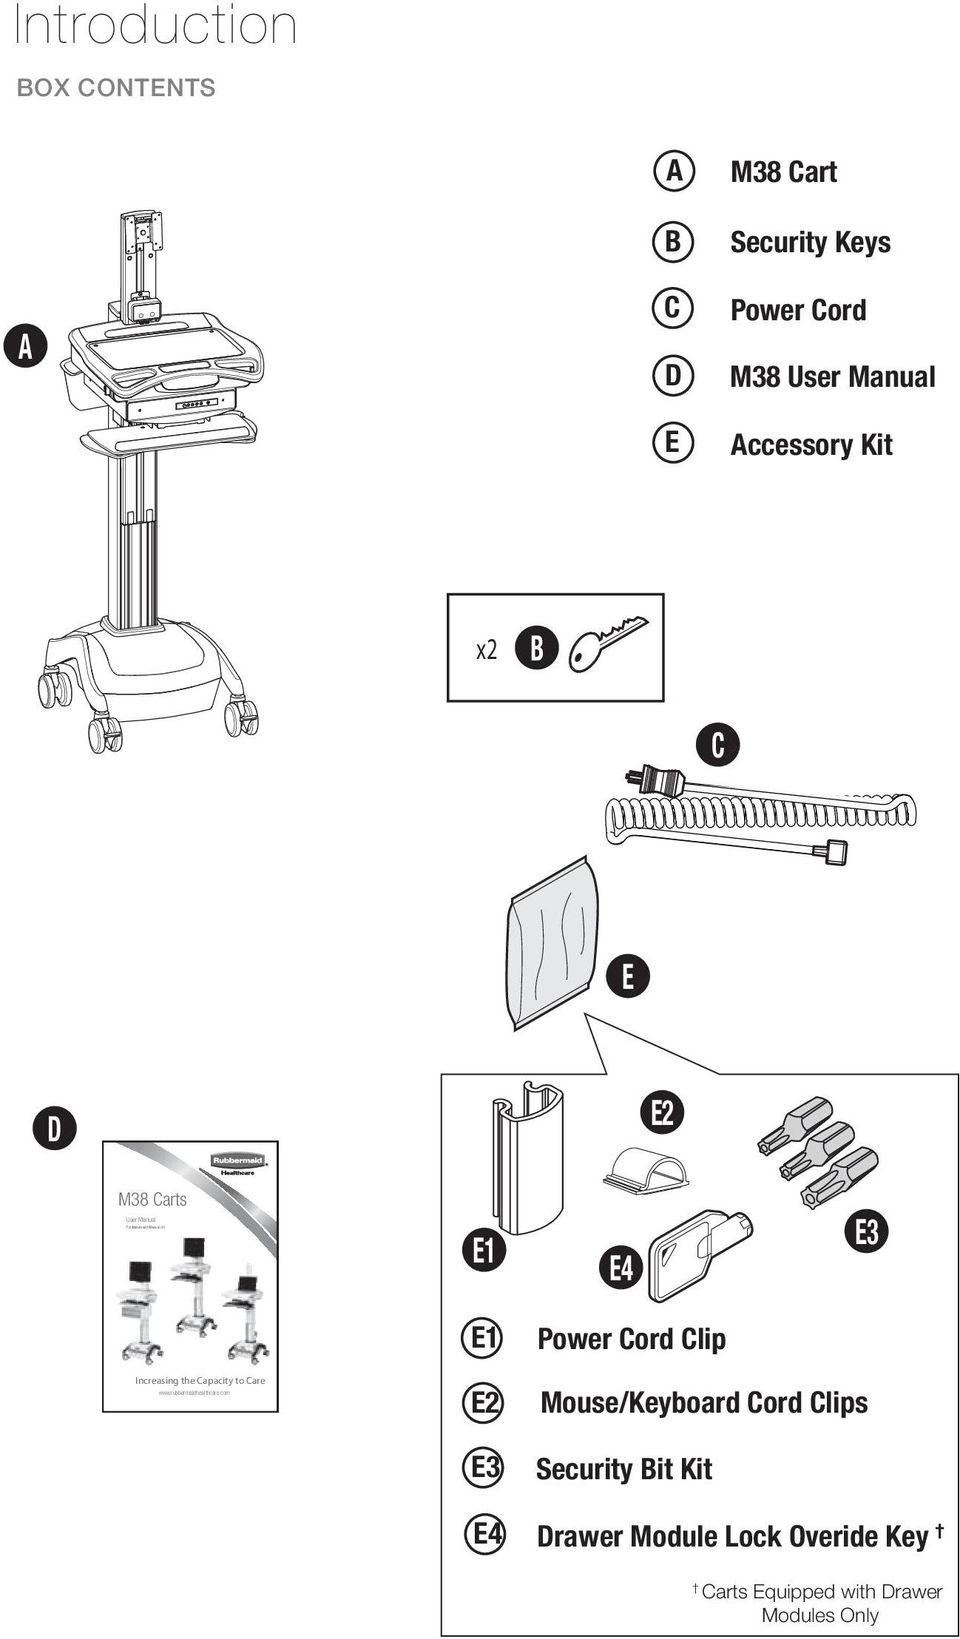 M38 Carts. Increasing the Capacity to Care. User Manual